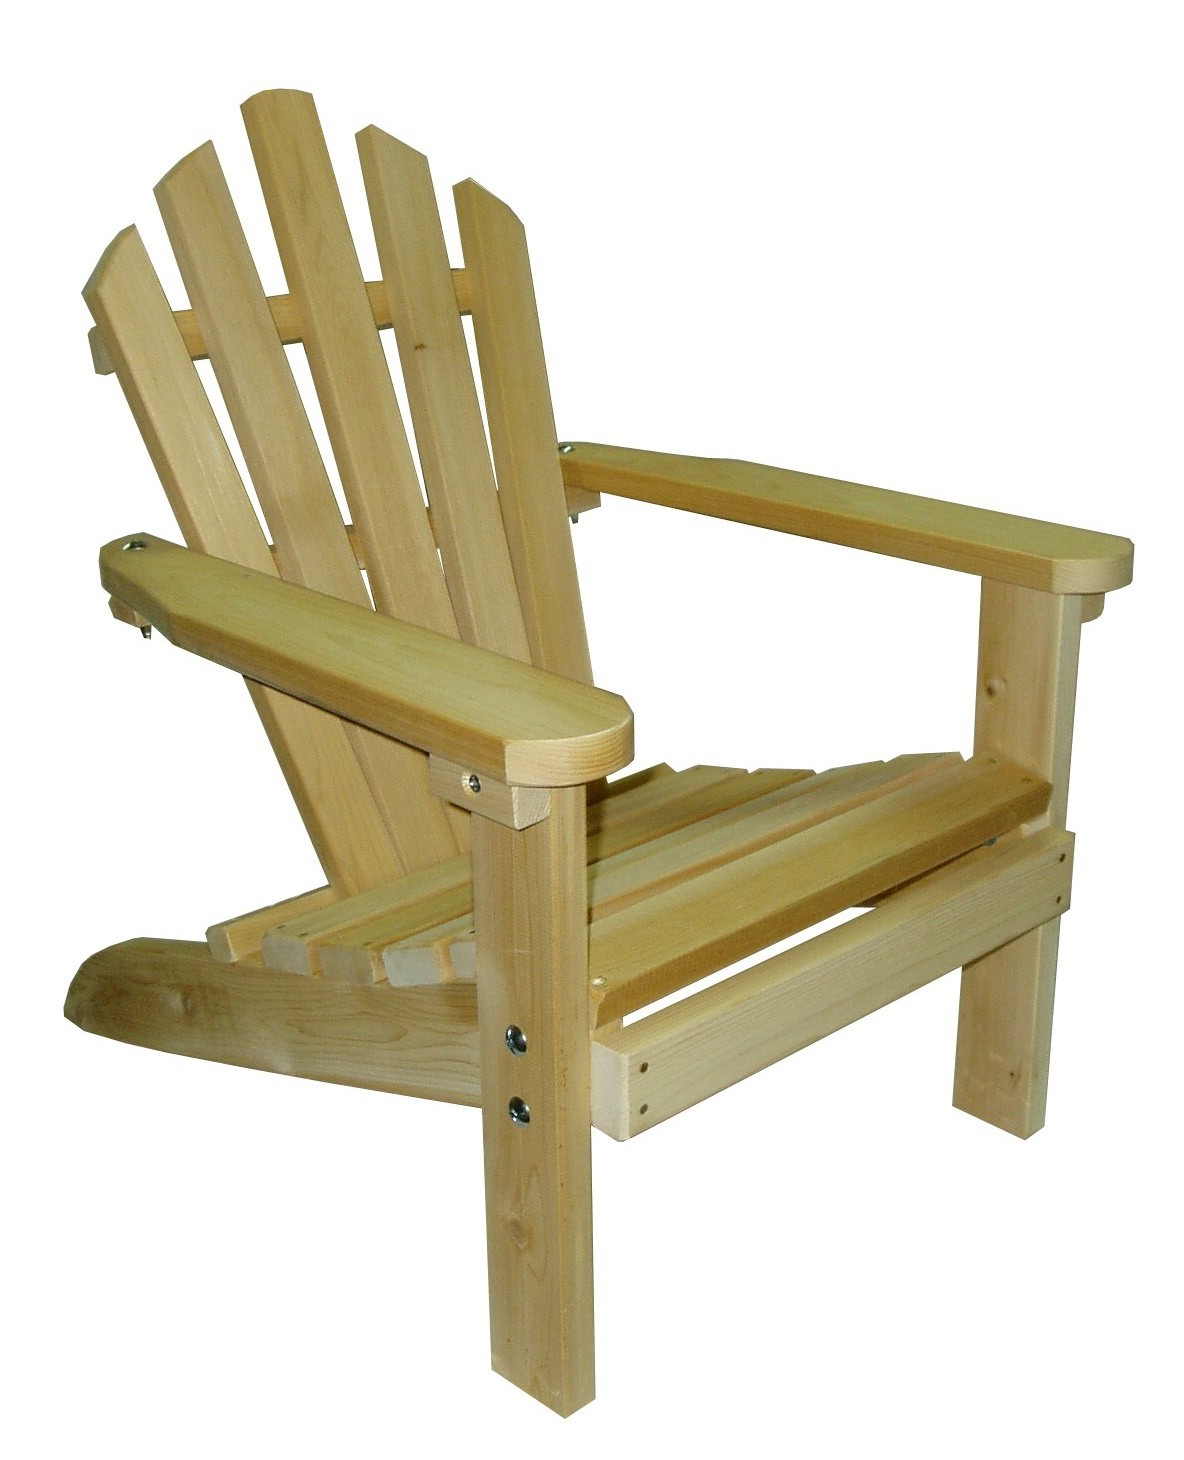 Chair Westport Fauteuil De Muskoka Adirondack Jardin Bois En ... destiné Fauteuil Adirondack Occasion